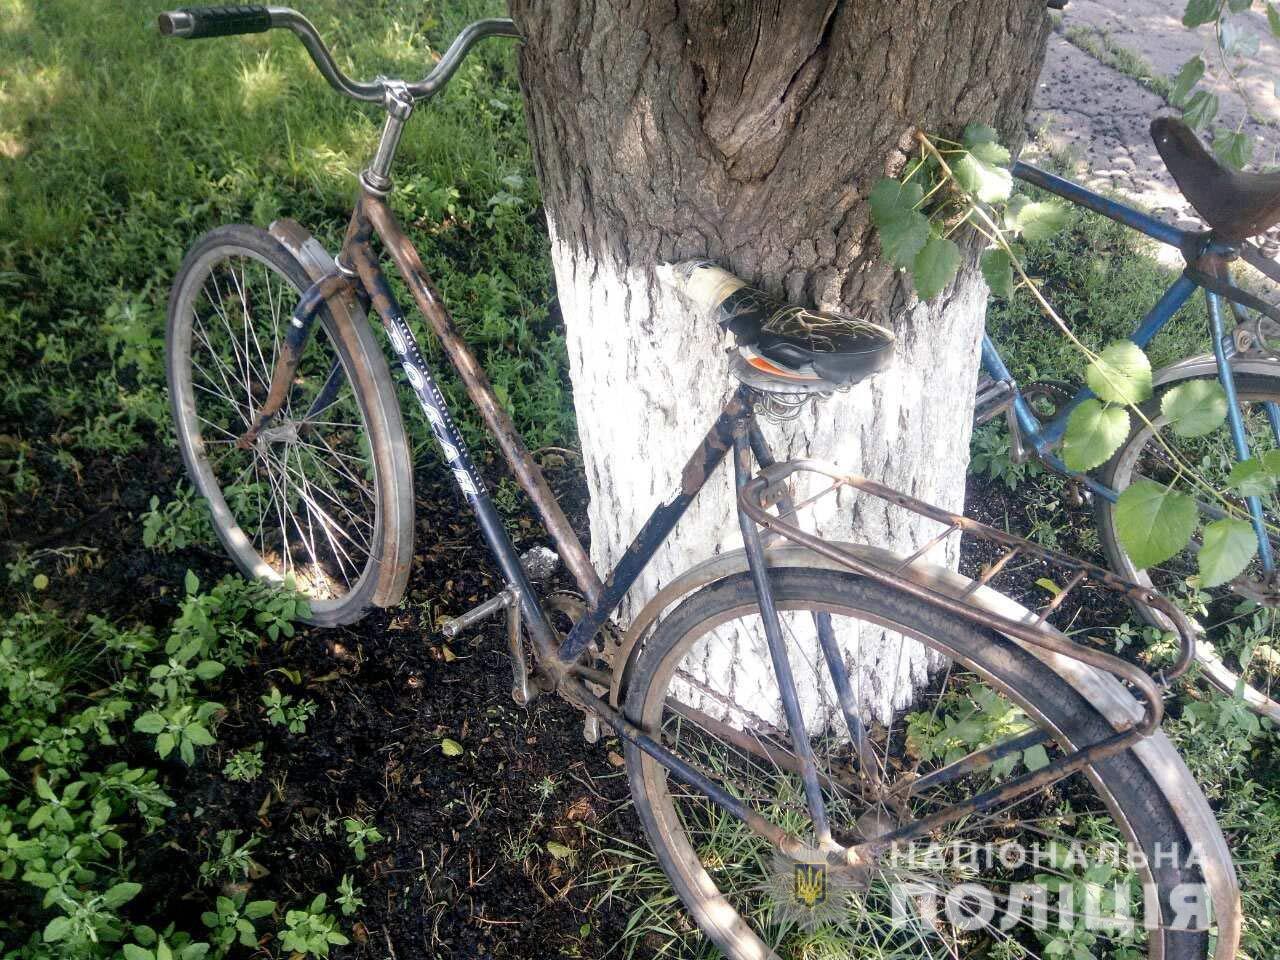 На Днепропетровщине мужчина с банкой марихуаны украл велосипед, - ФОТО, фото-1